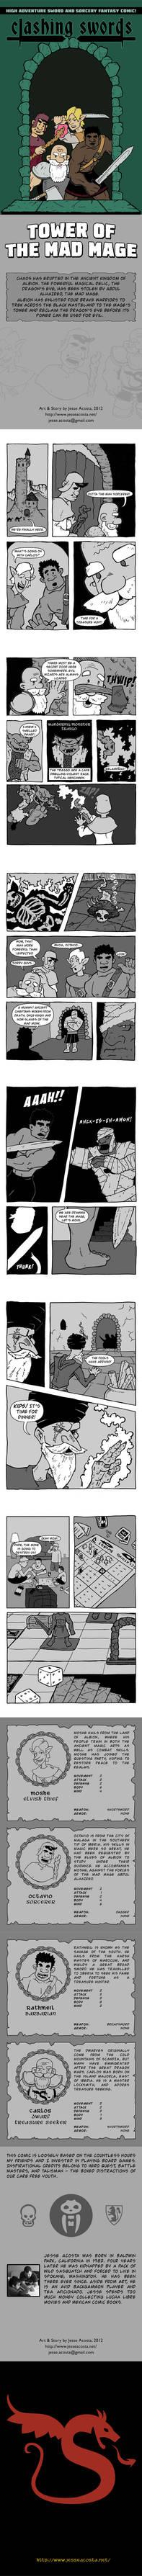 Clashing Swords Mini Comic